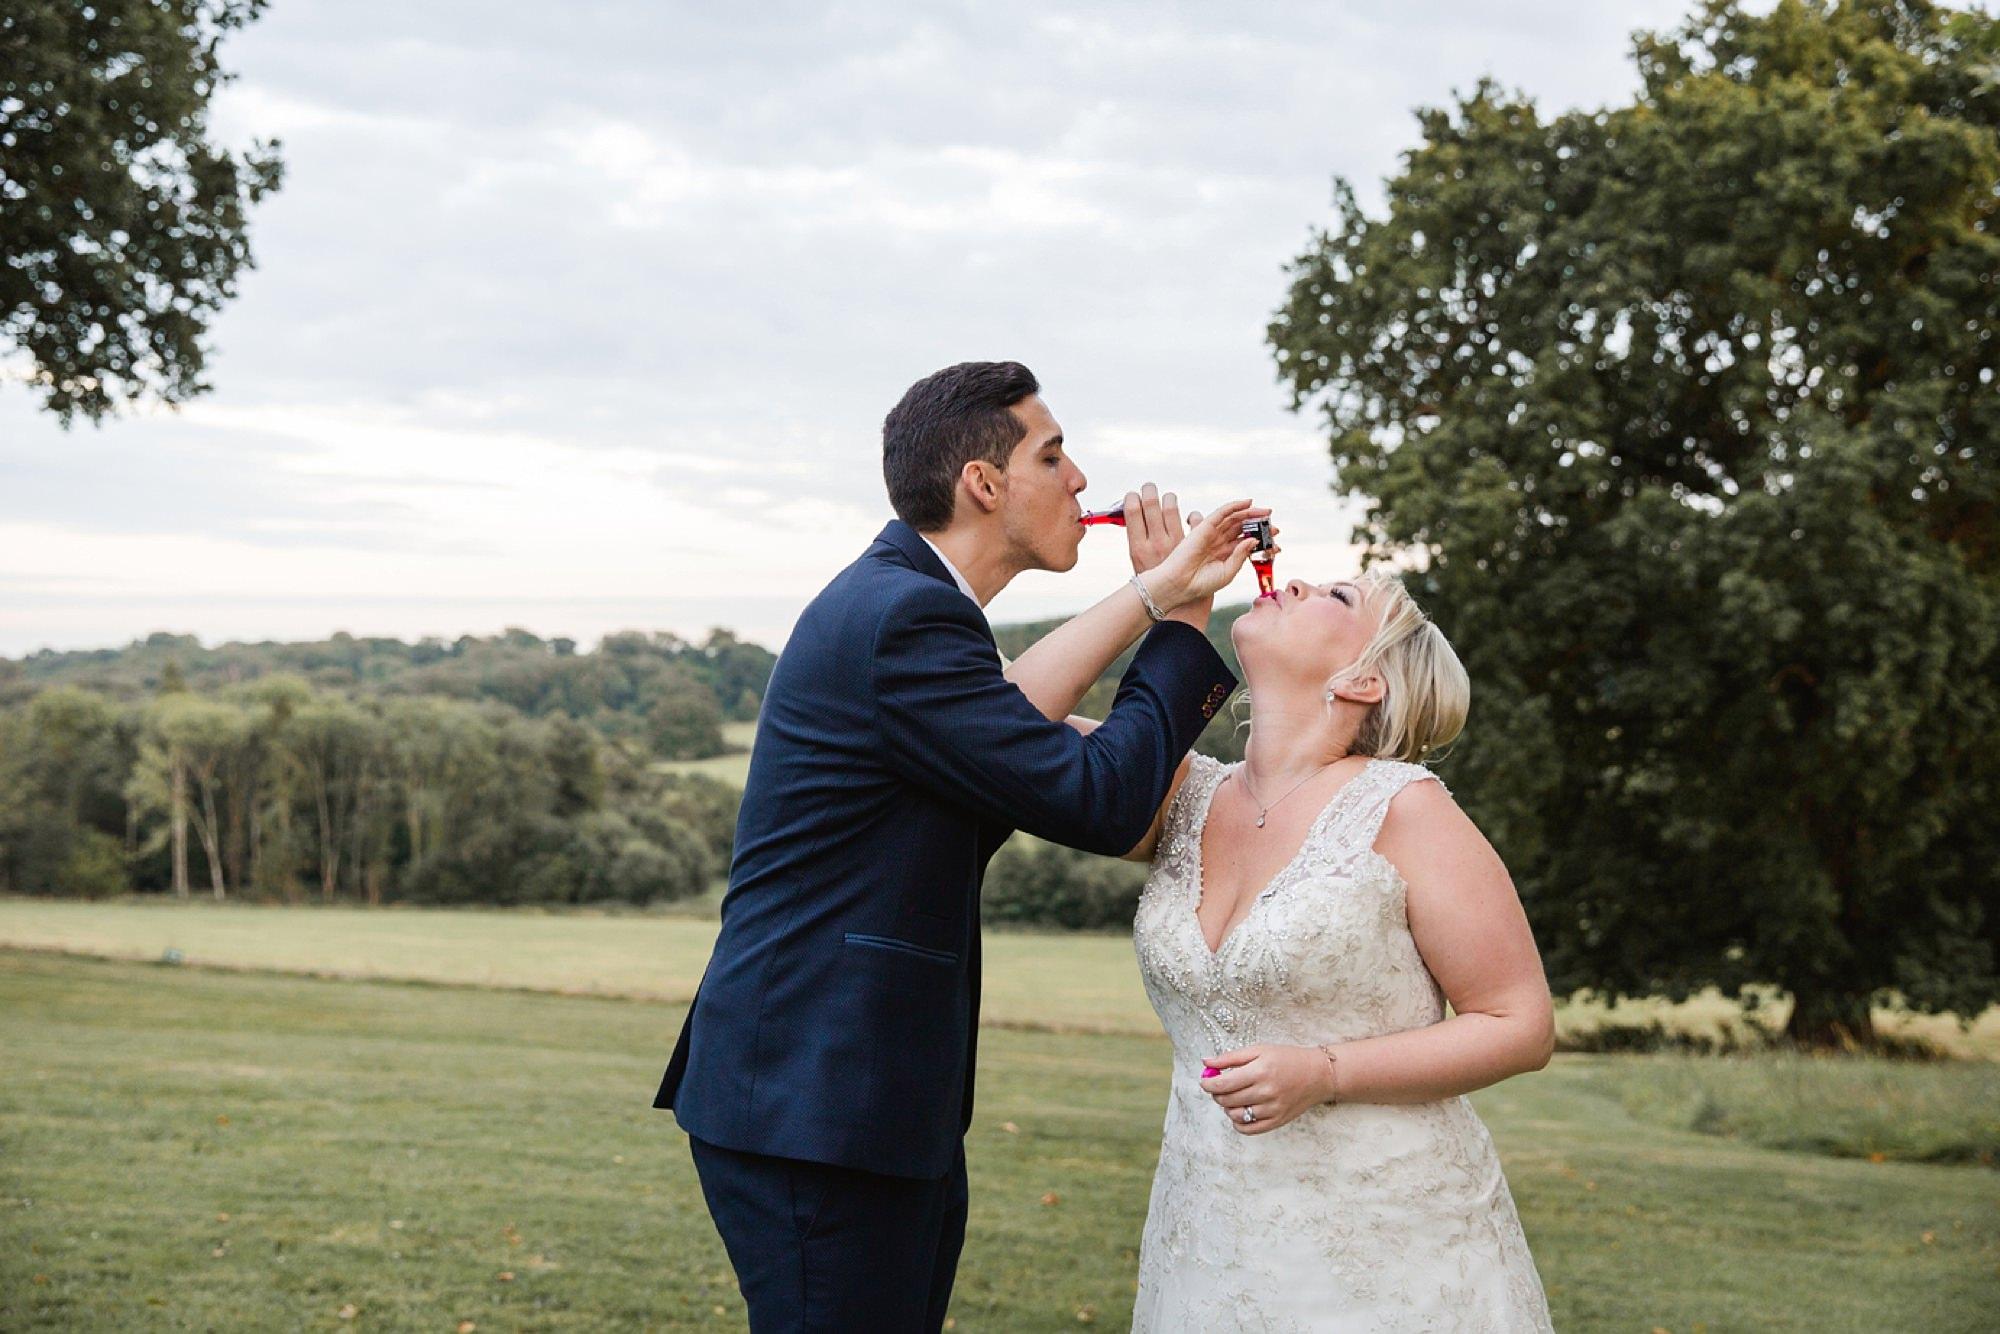 Bignor Park wedding photography groom and bride doing shots